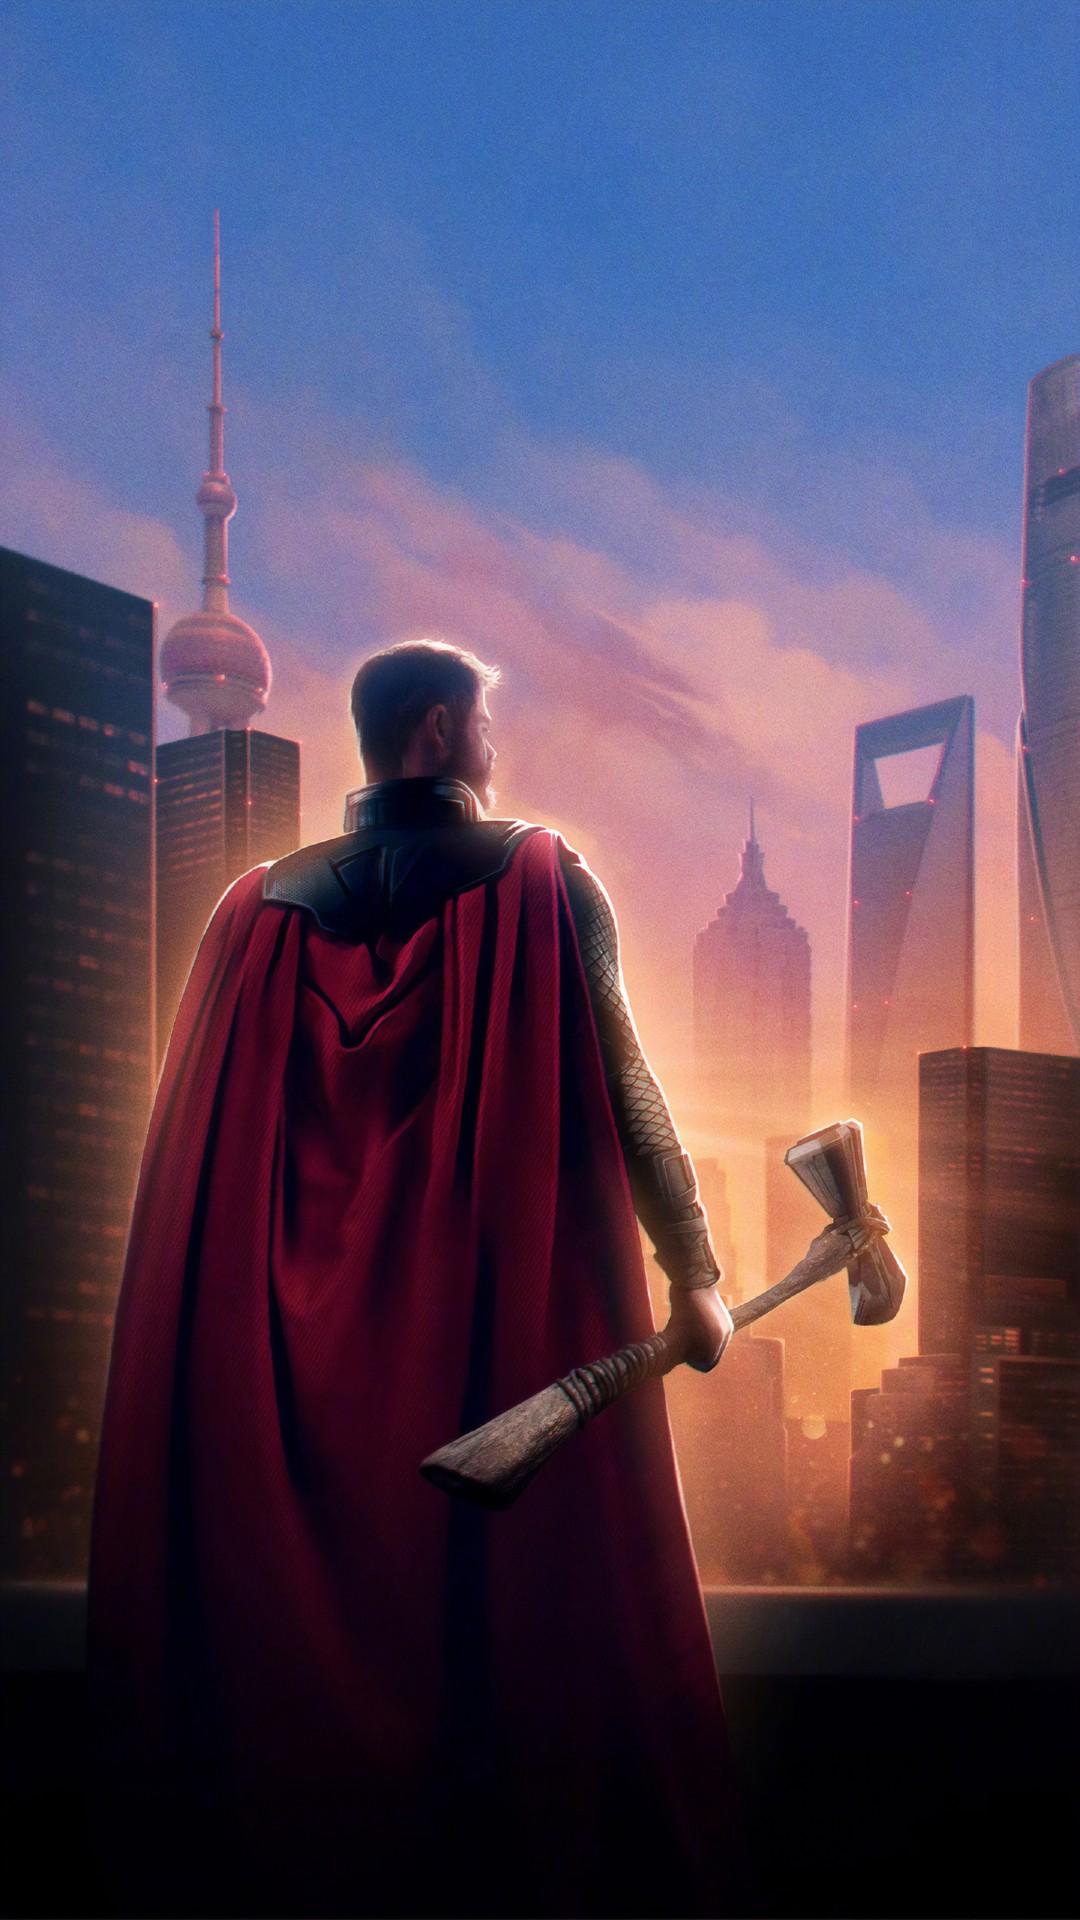 Avengers Endgame 2019 Wallpaper Phone With High-resolution - Thor Wallpaper Iphone 7 Plus - HD Wallpaper